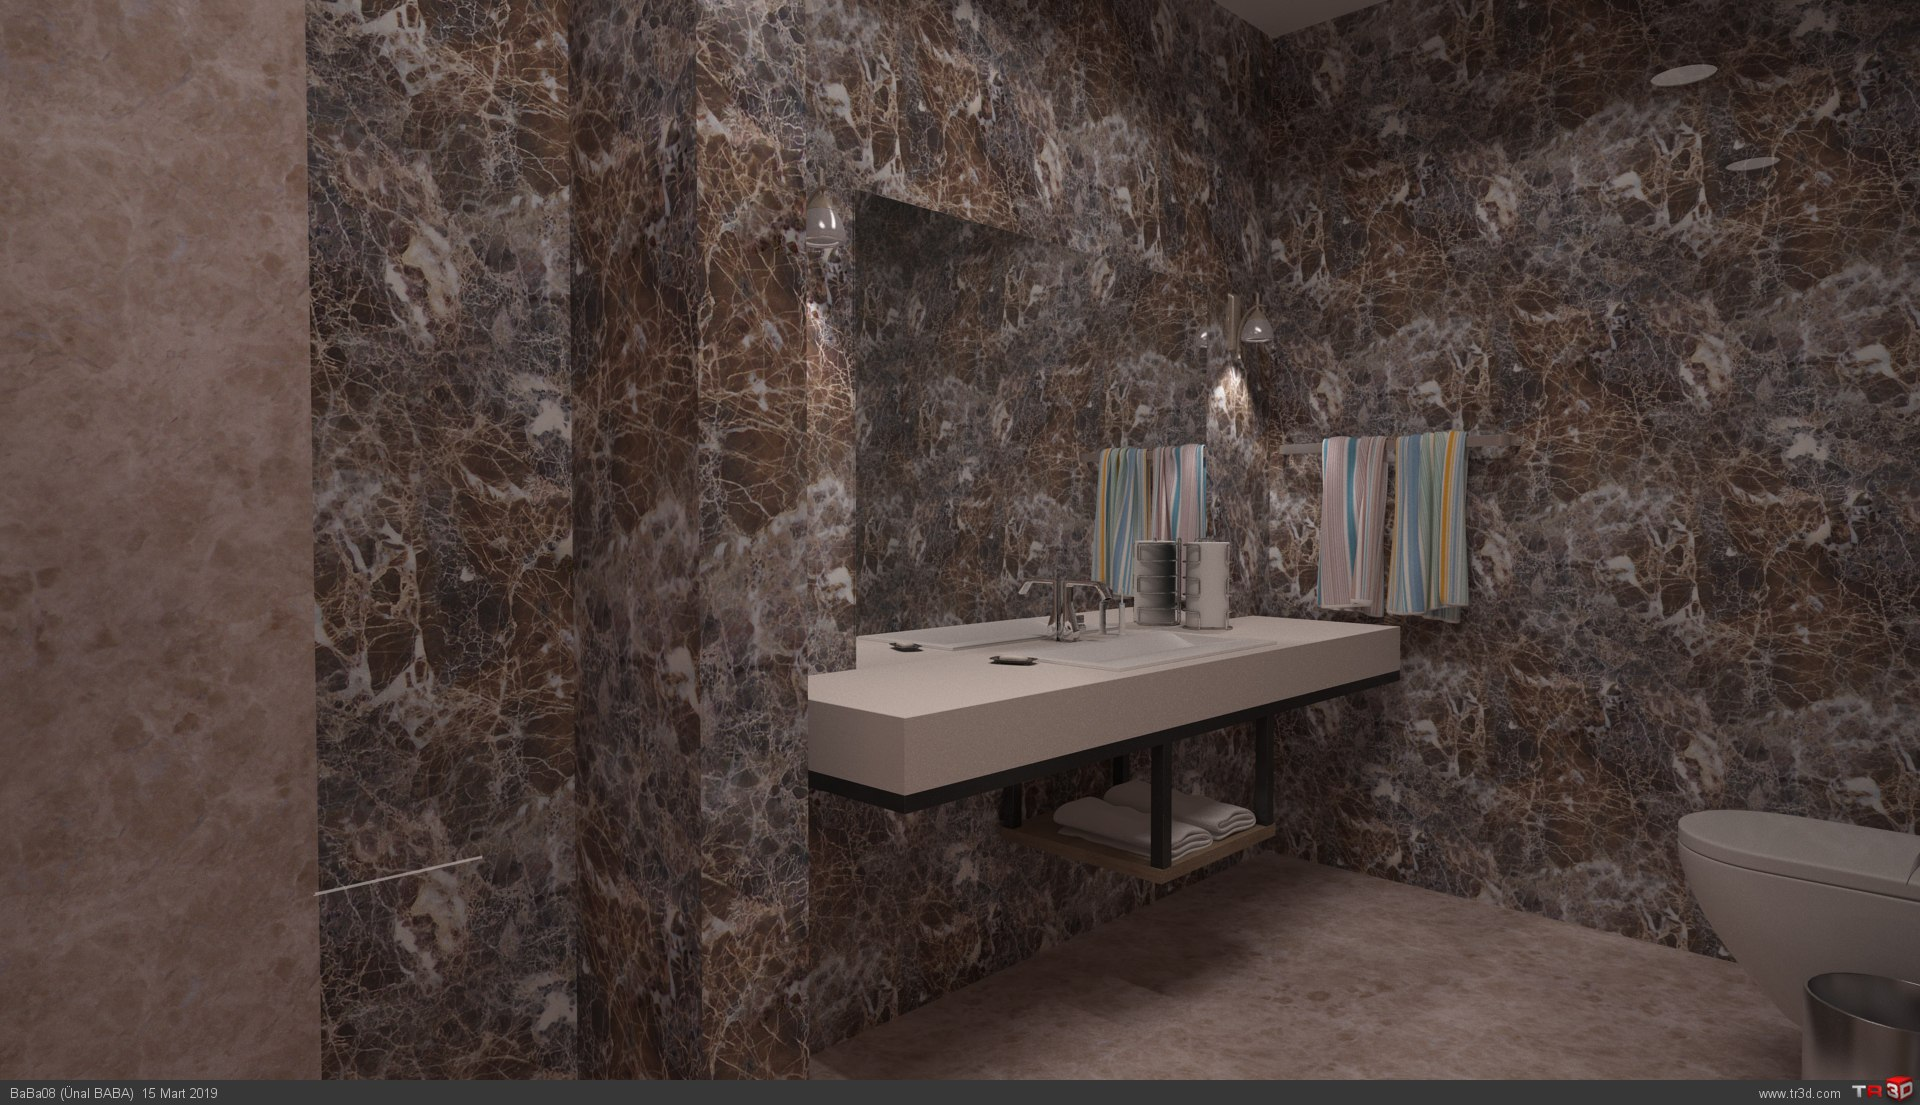 Villa İç Dekorasyonu - Mutfak ve Banyo  3